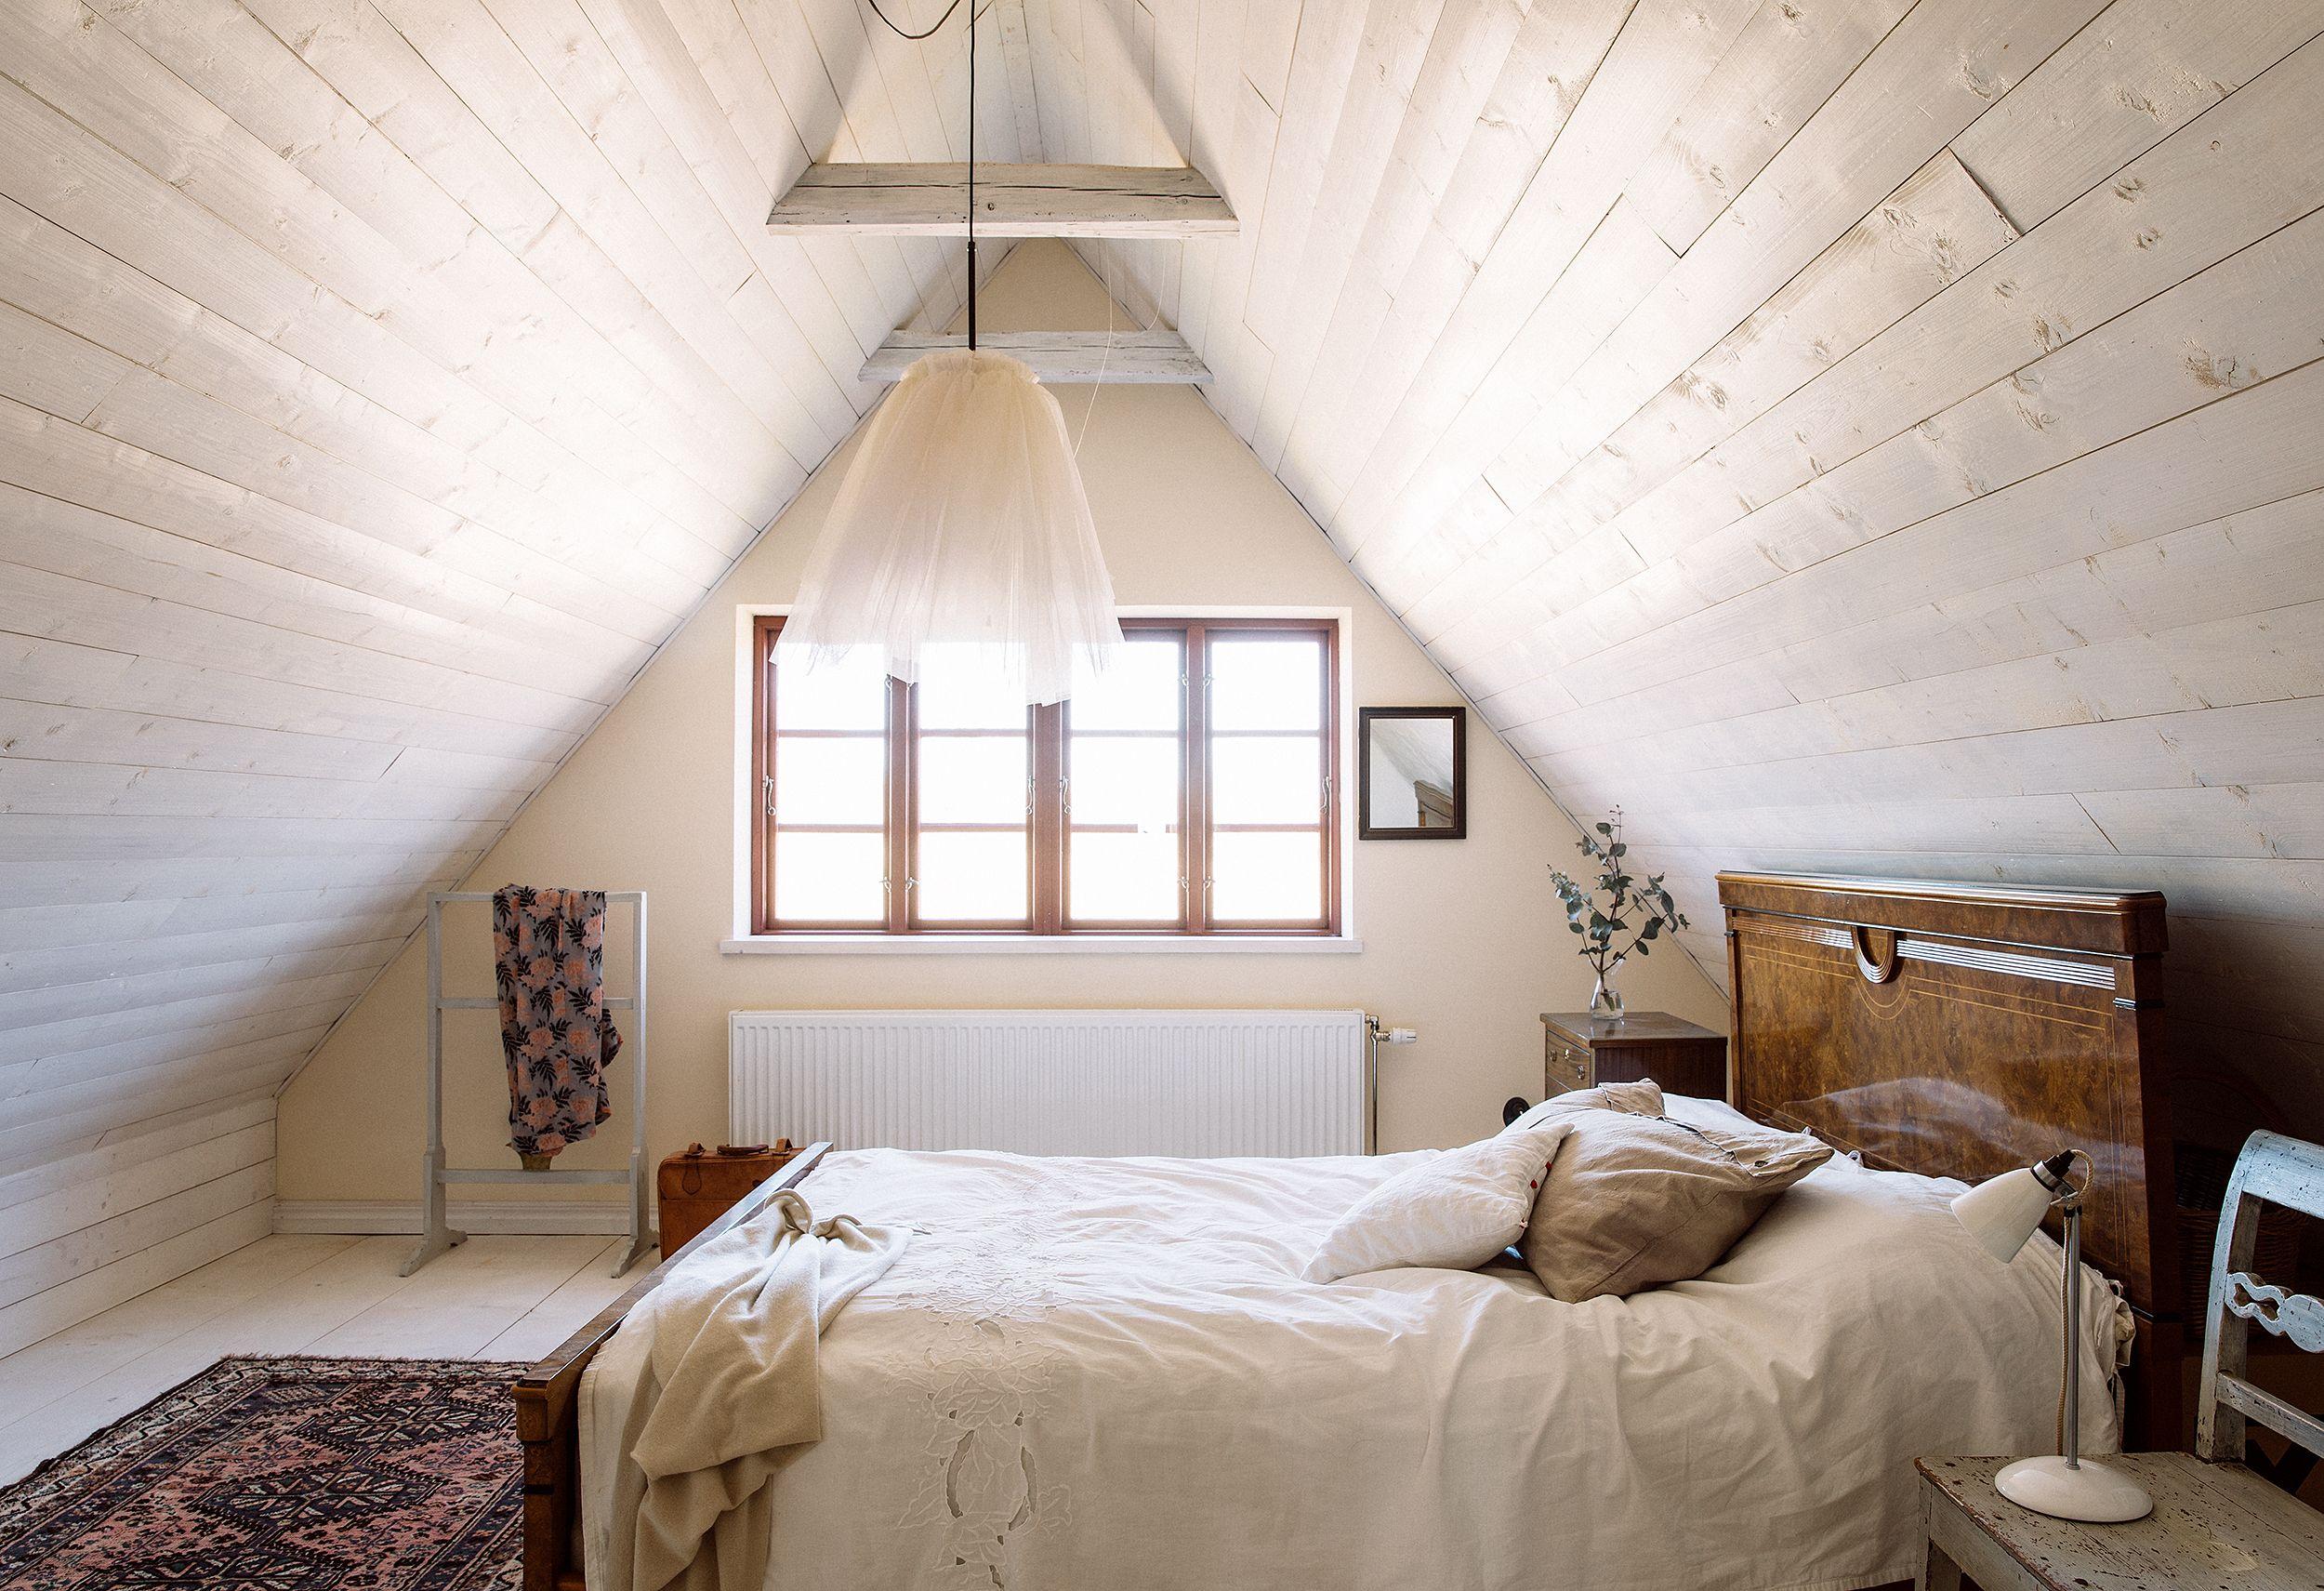 bedroom virtual designer rec room decorating ideas virtual apartment decorating House Beautiful